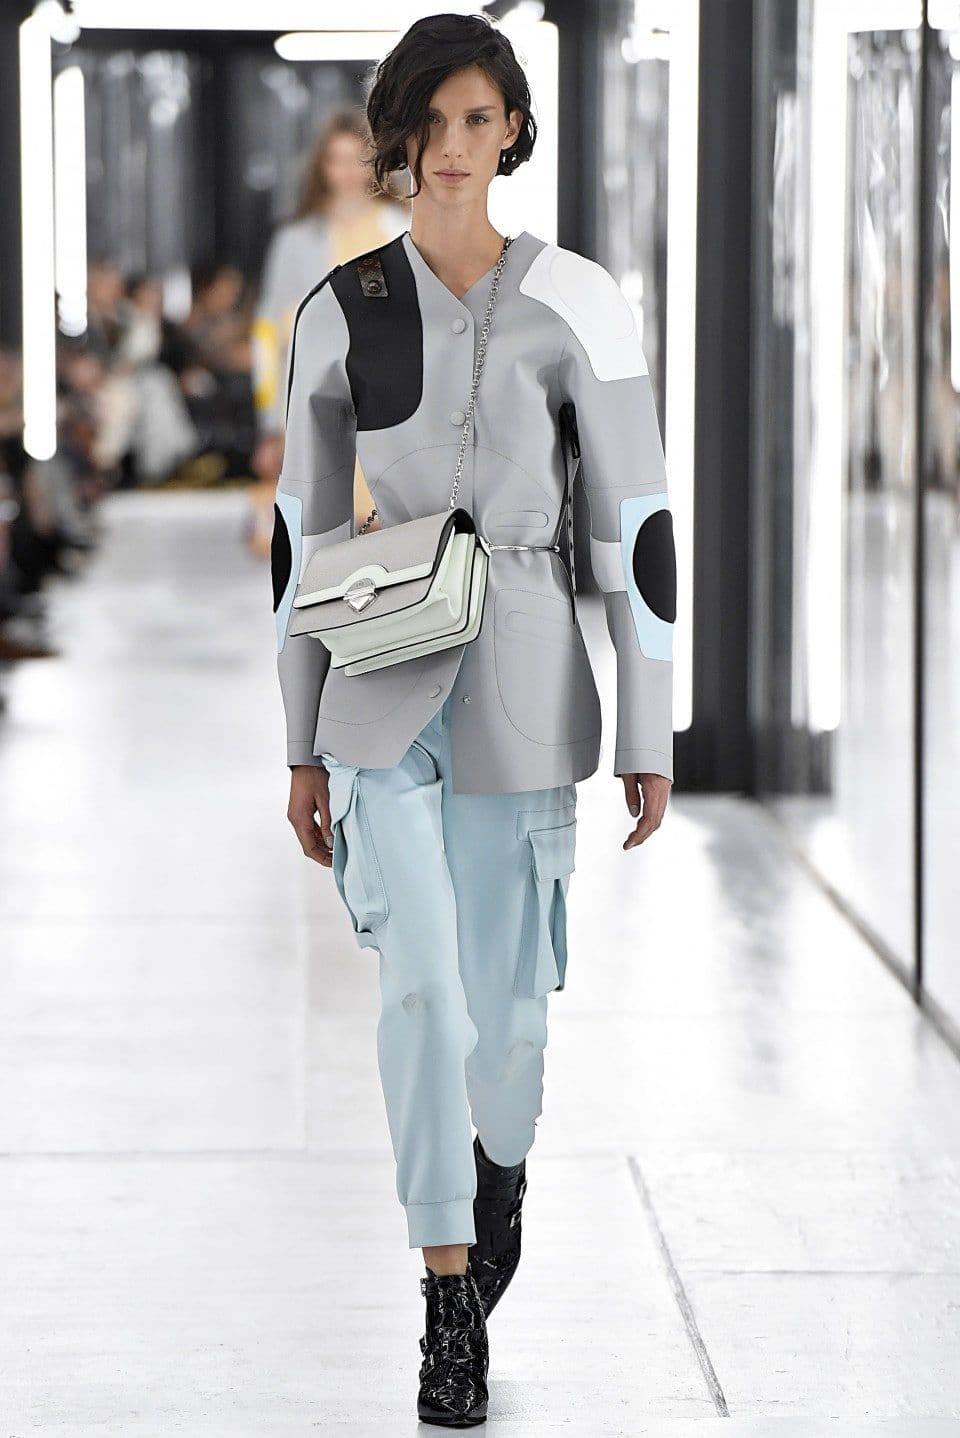 Louis Vuitton / Cortesia